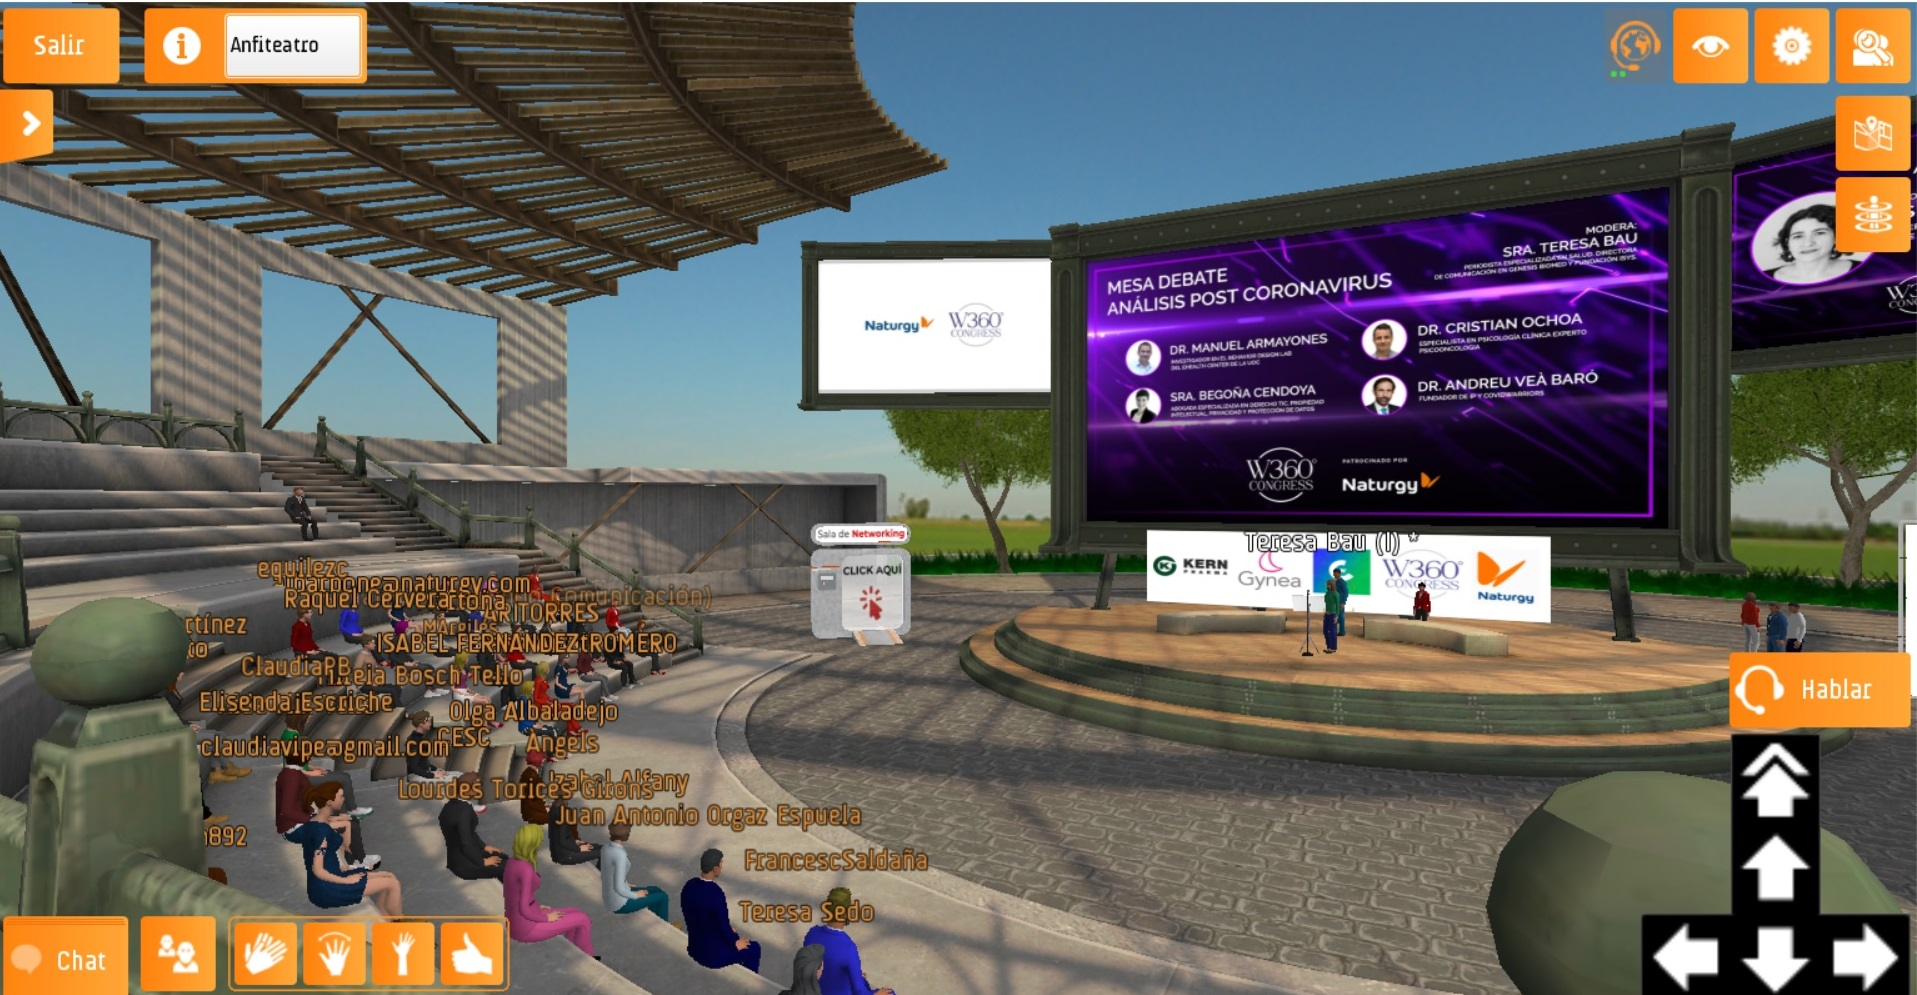 Coronatech 2020 Realidad Virtual W360C - Naturgy (12)